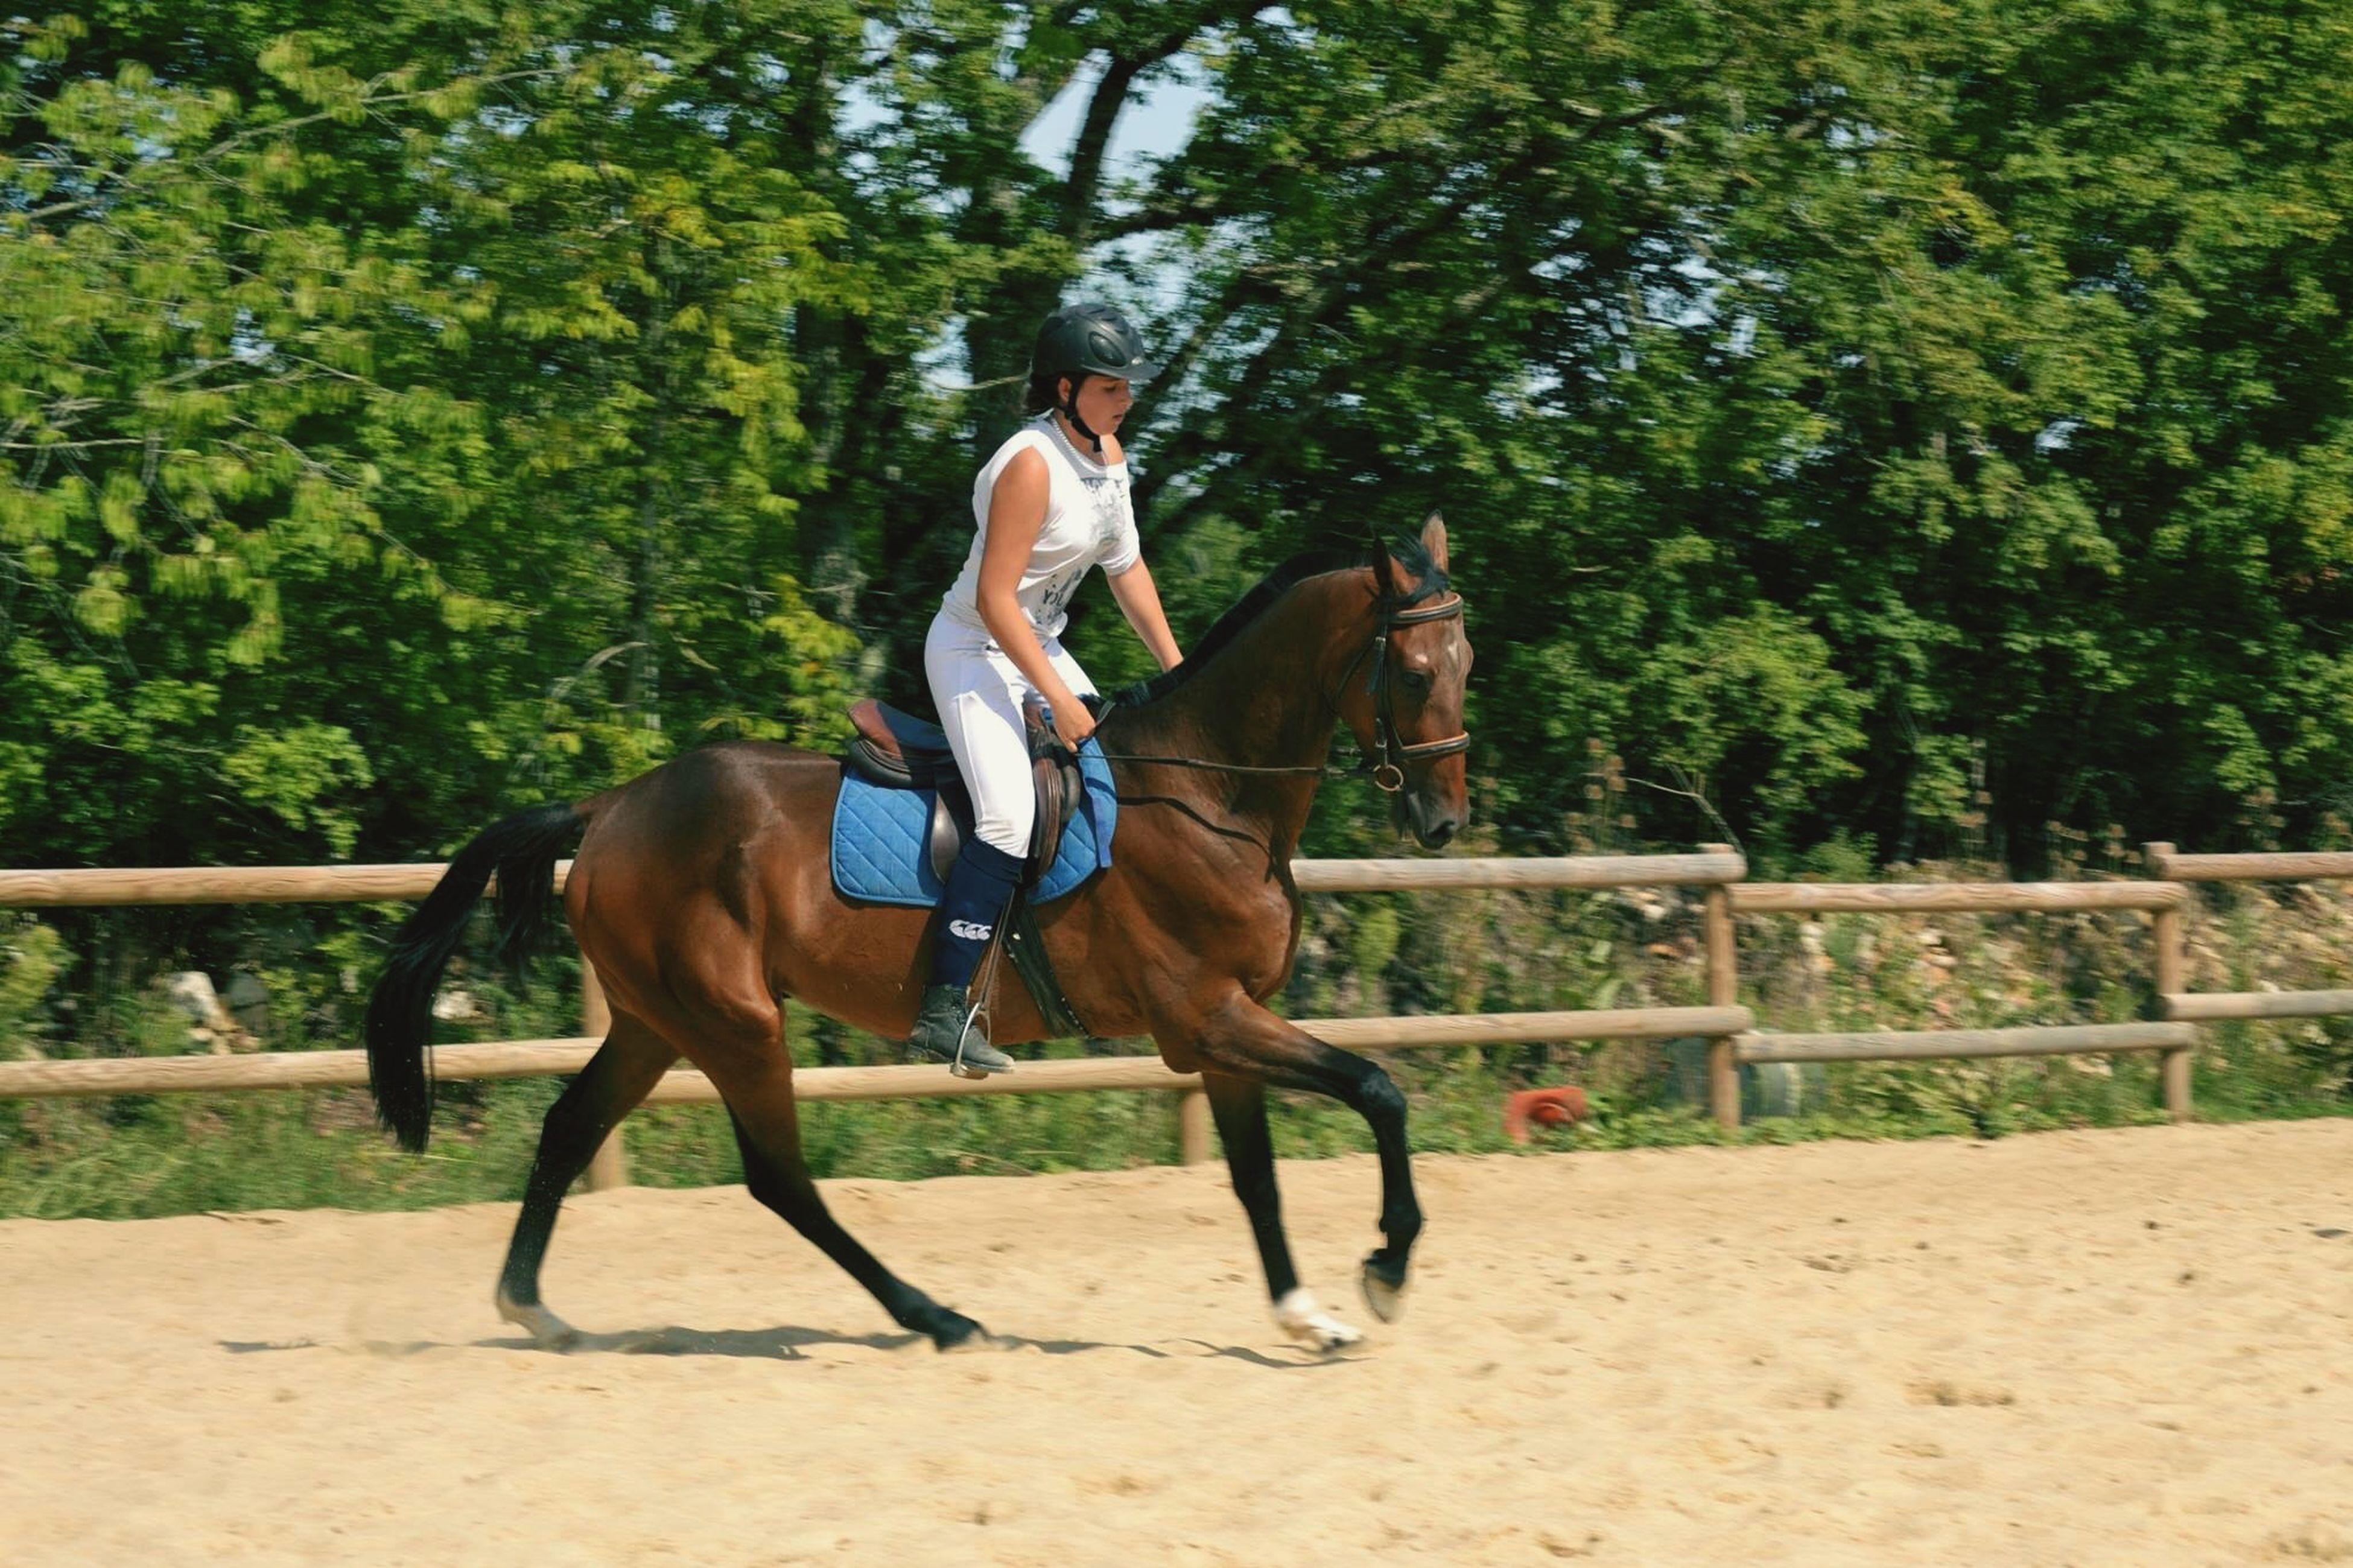 horse, animal themes, domestic animals, mammal, one animal, tree, working animal, full length, two animals, herbivorous, standing, sunlight, men, pets, livestock, dog, riding, day